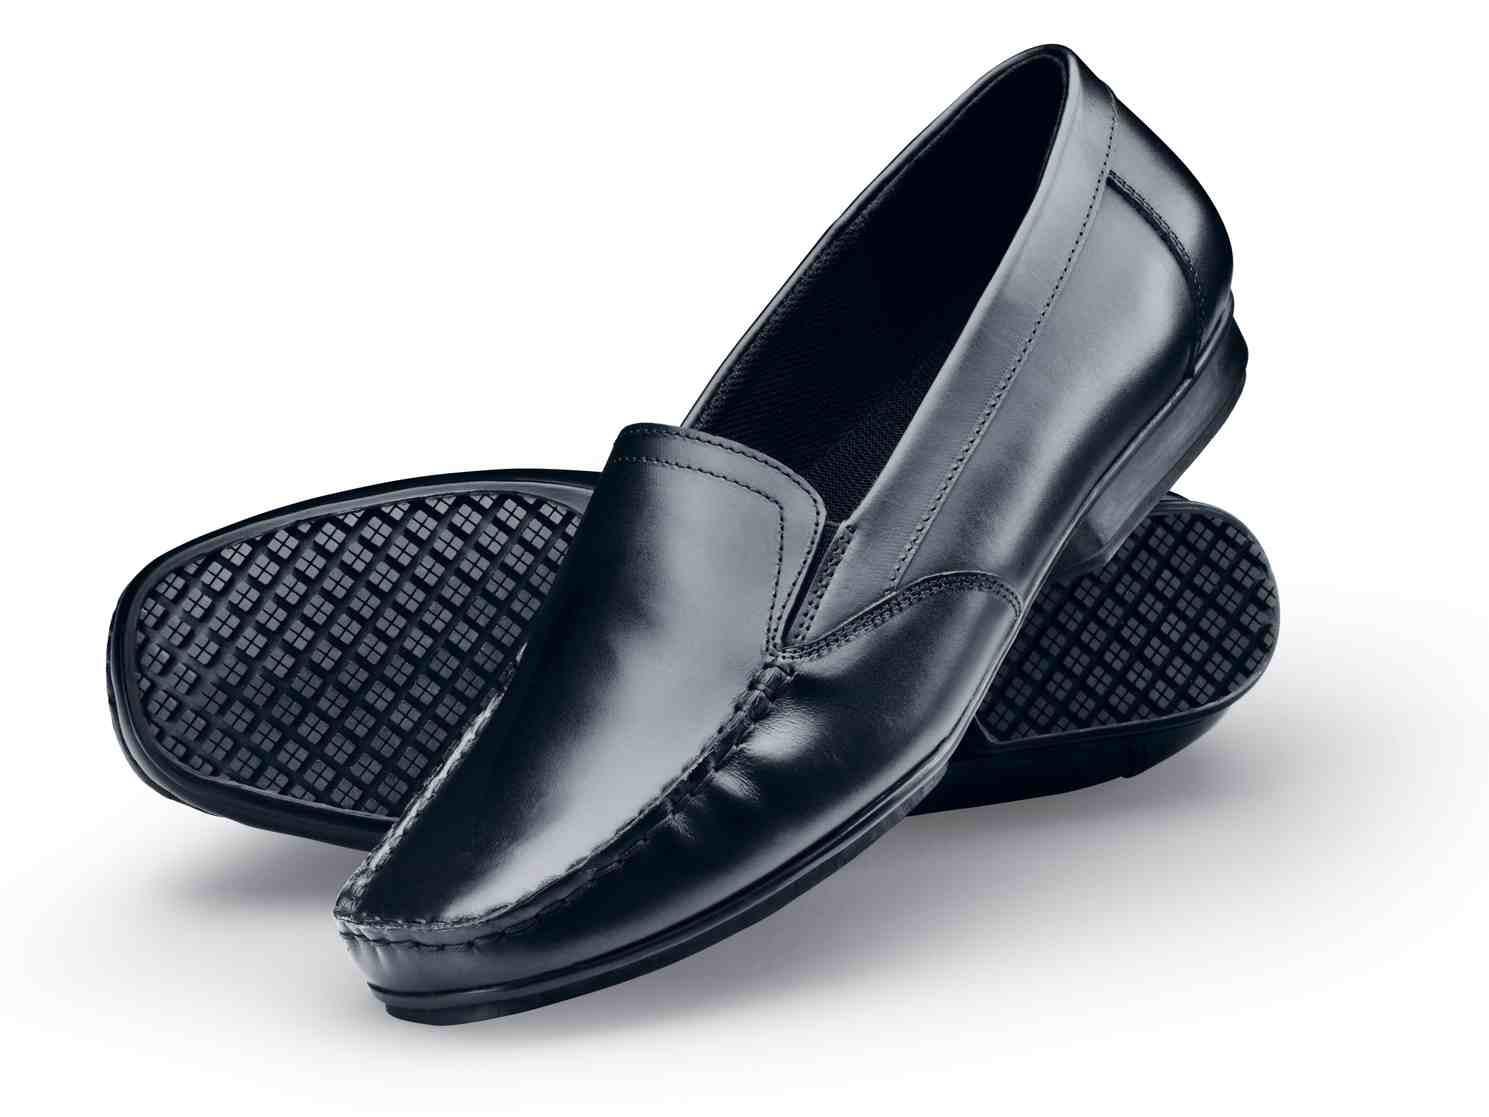 3616 shoes for crews jenni damen schuhe serviceschuhe. Black Bedroom Furniture Sets. Home Design Ideas